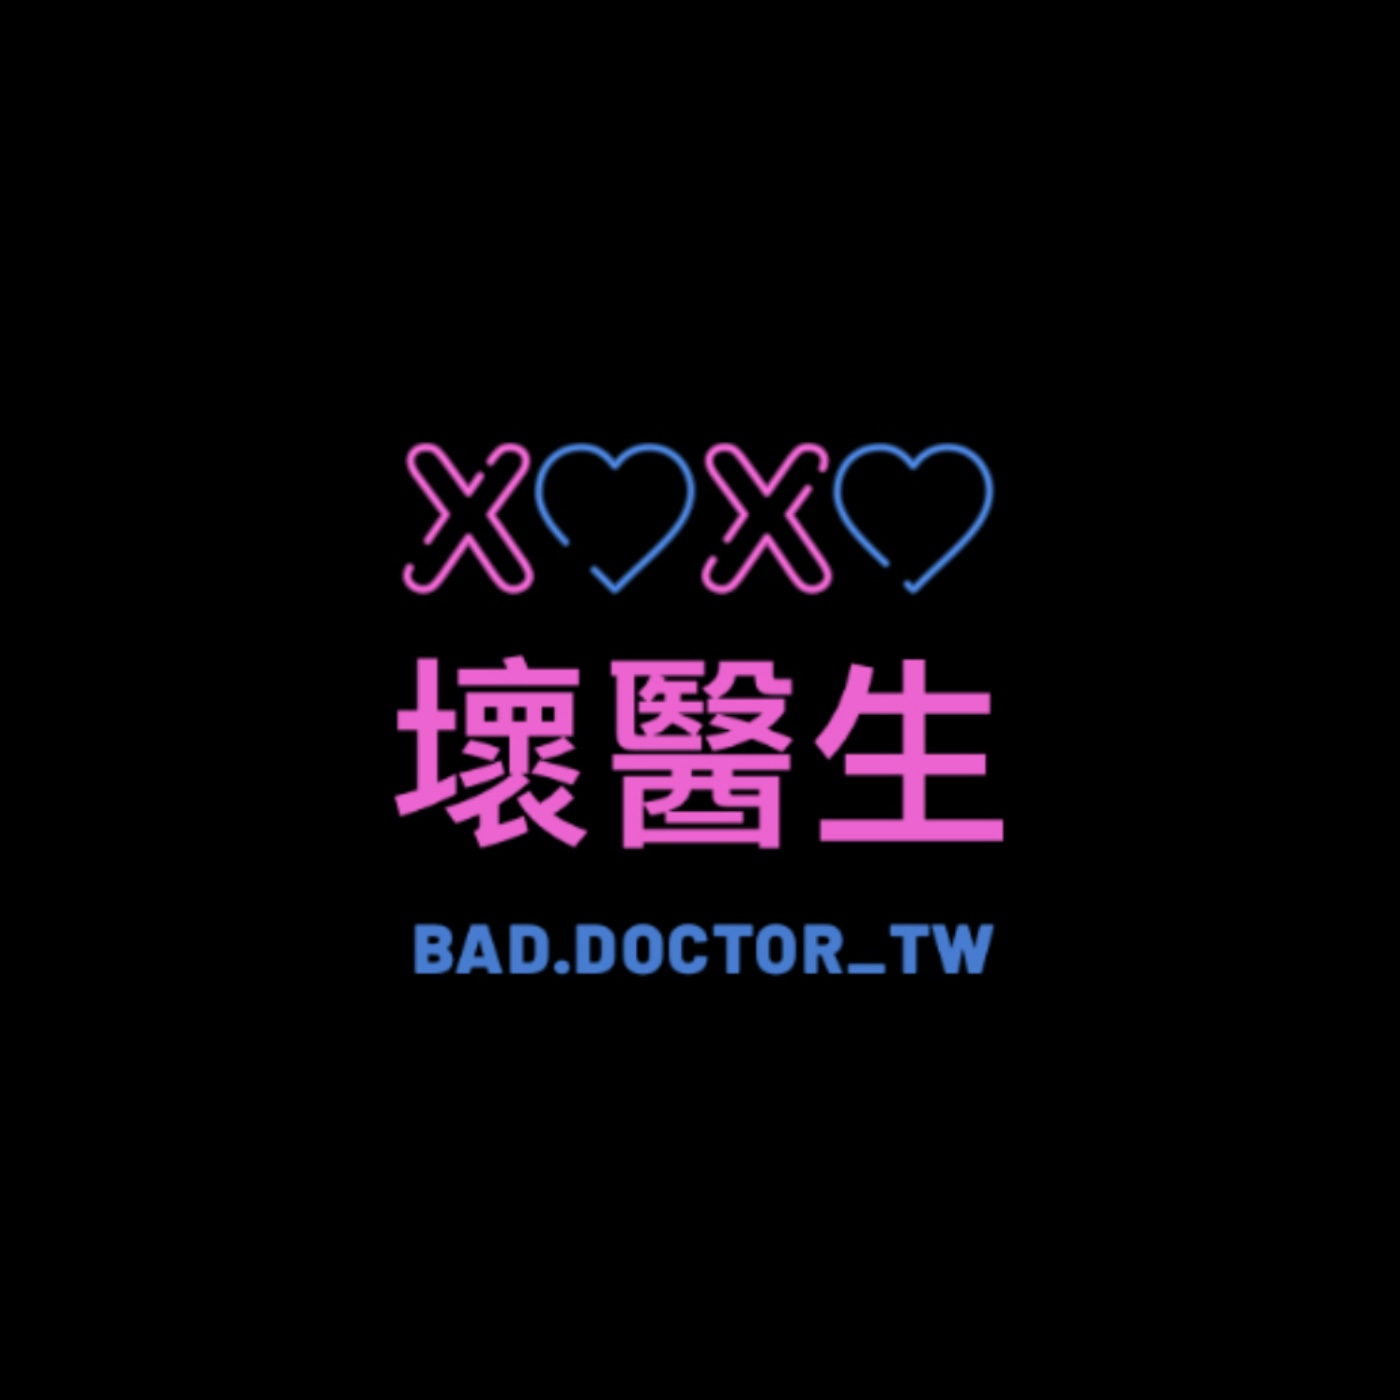 EP.00|壞醫生的誕生